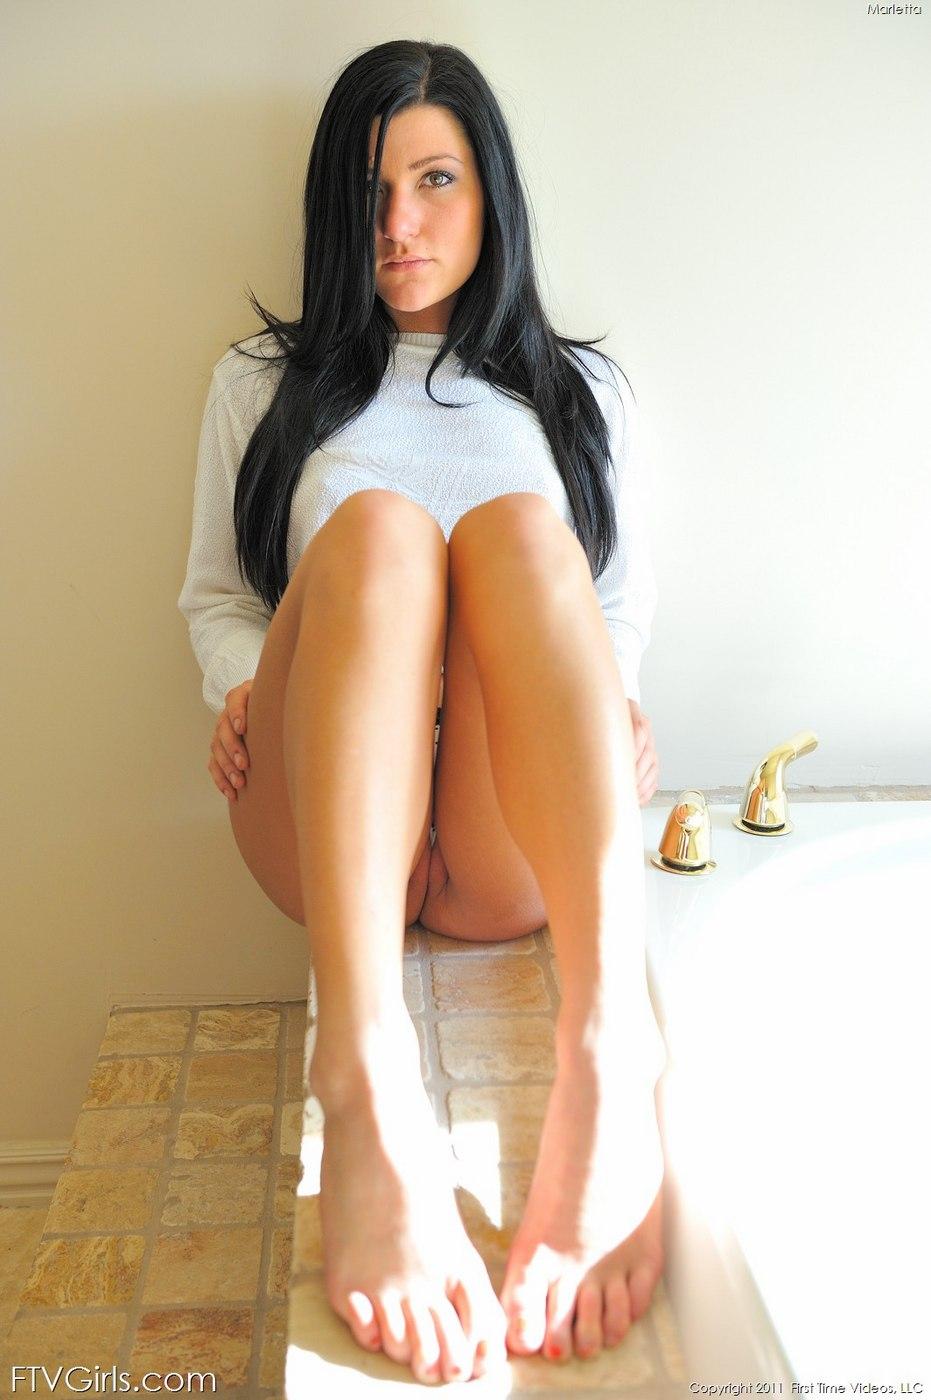 FTV Girls Online / Marletta